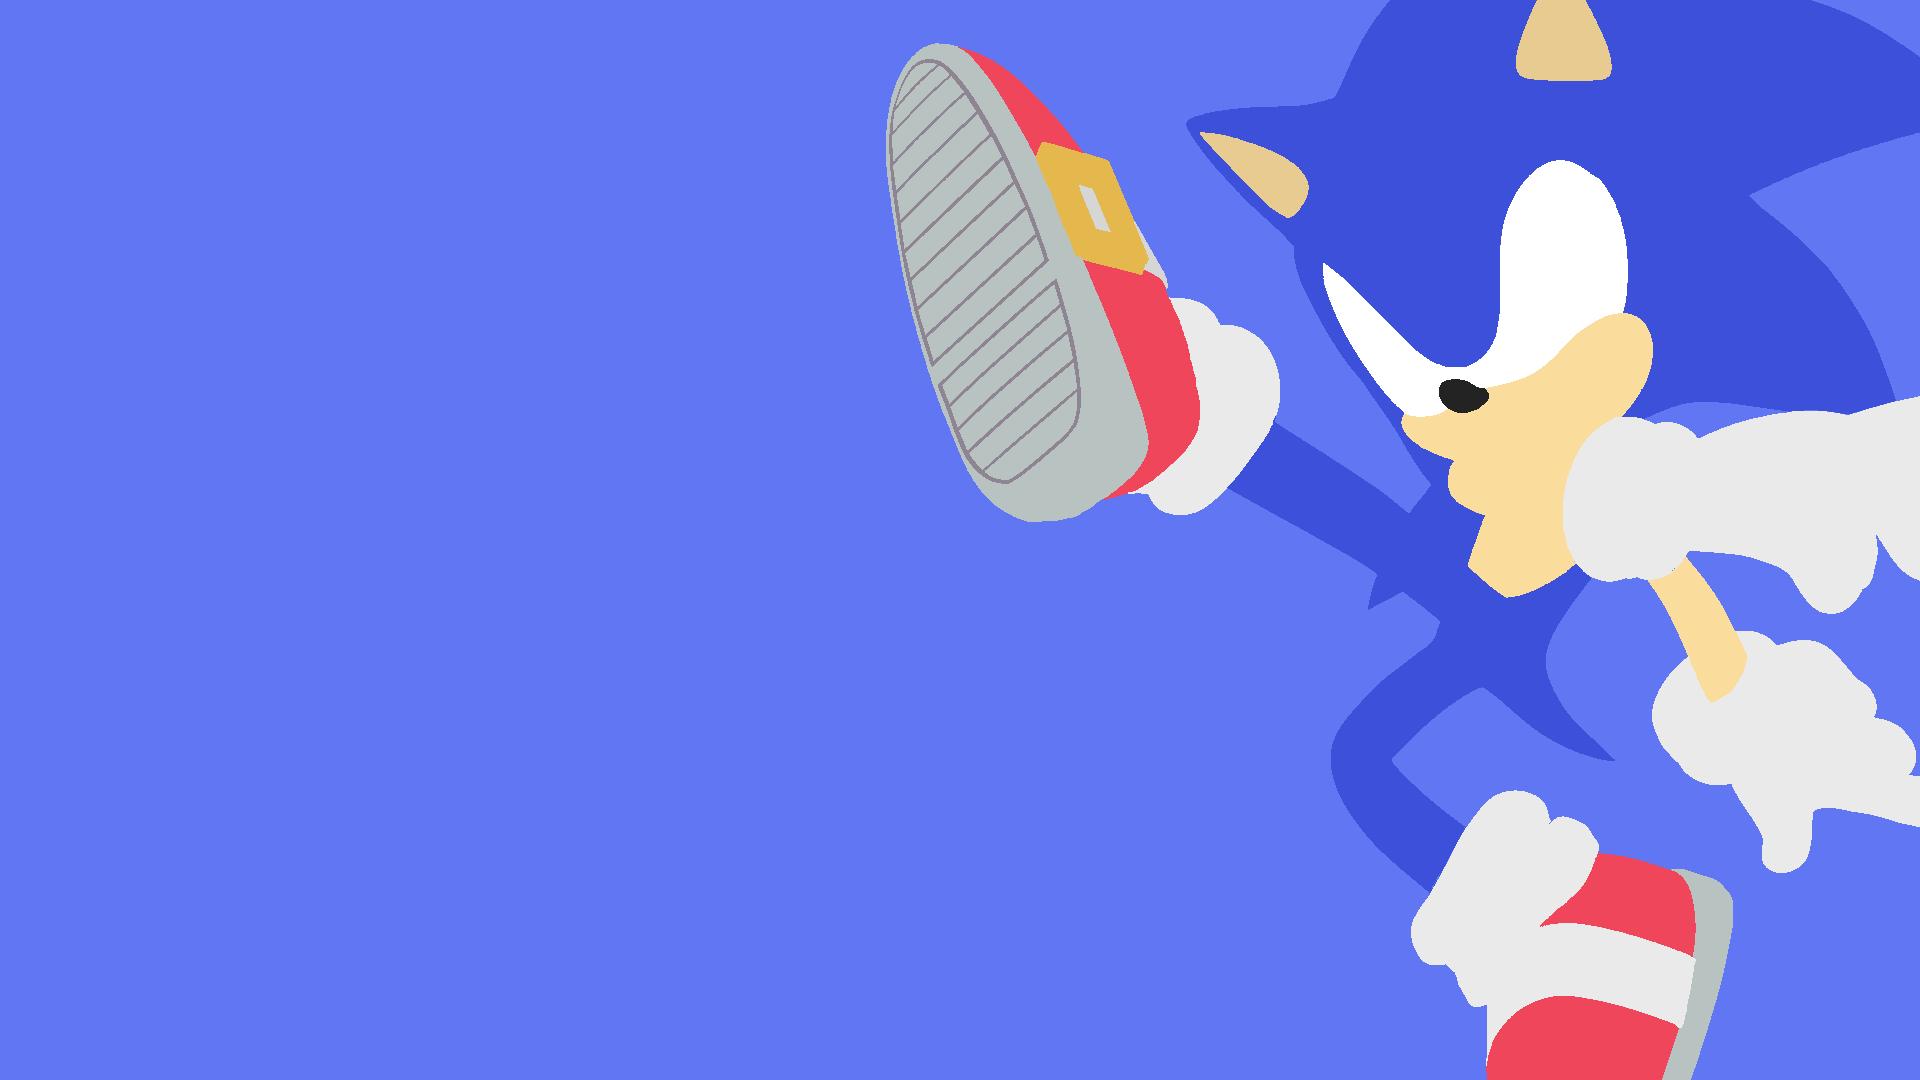 Sonic Minimalist Wallpaper 1080p By Sp5rky On Deviantart